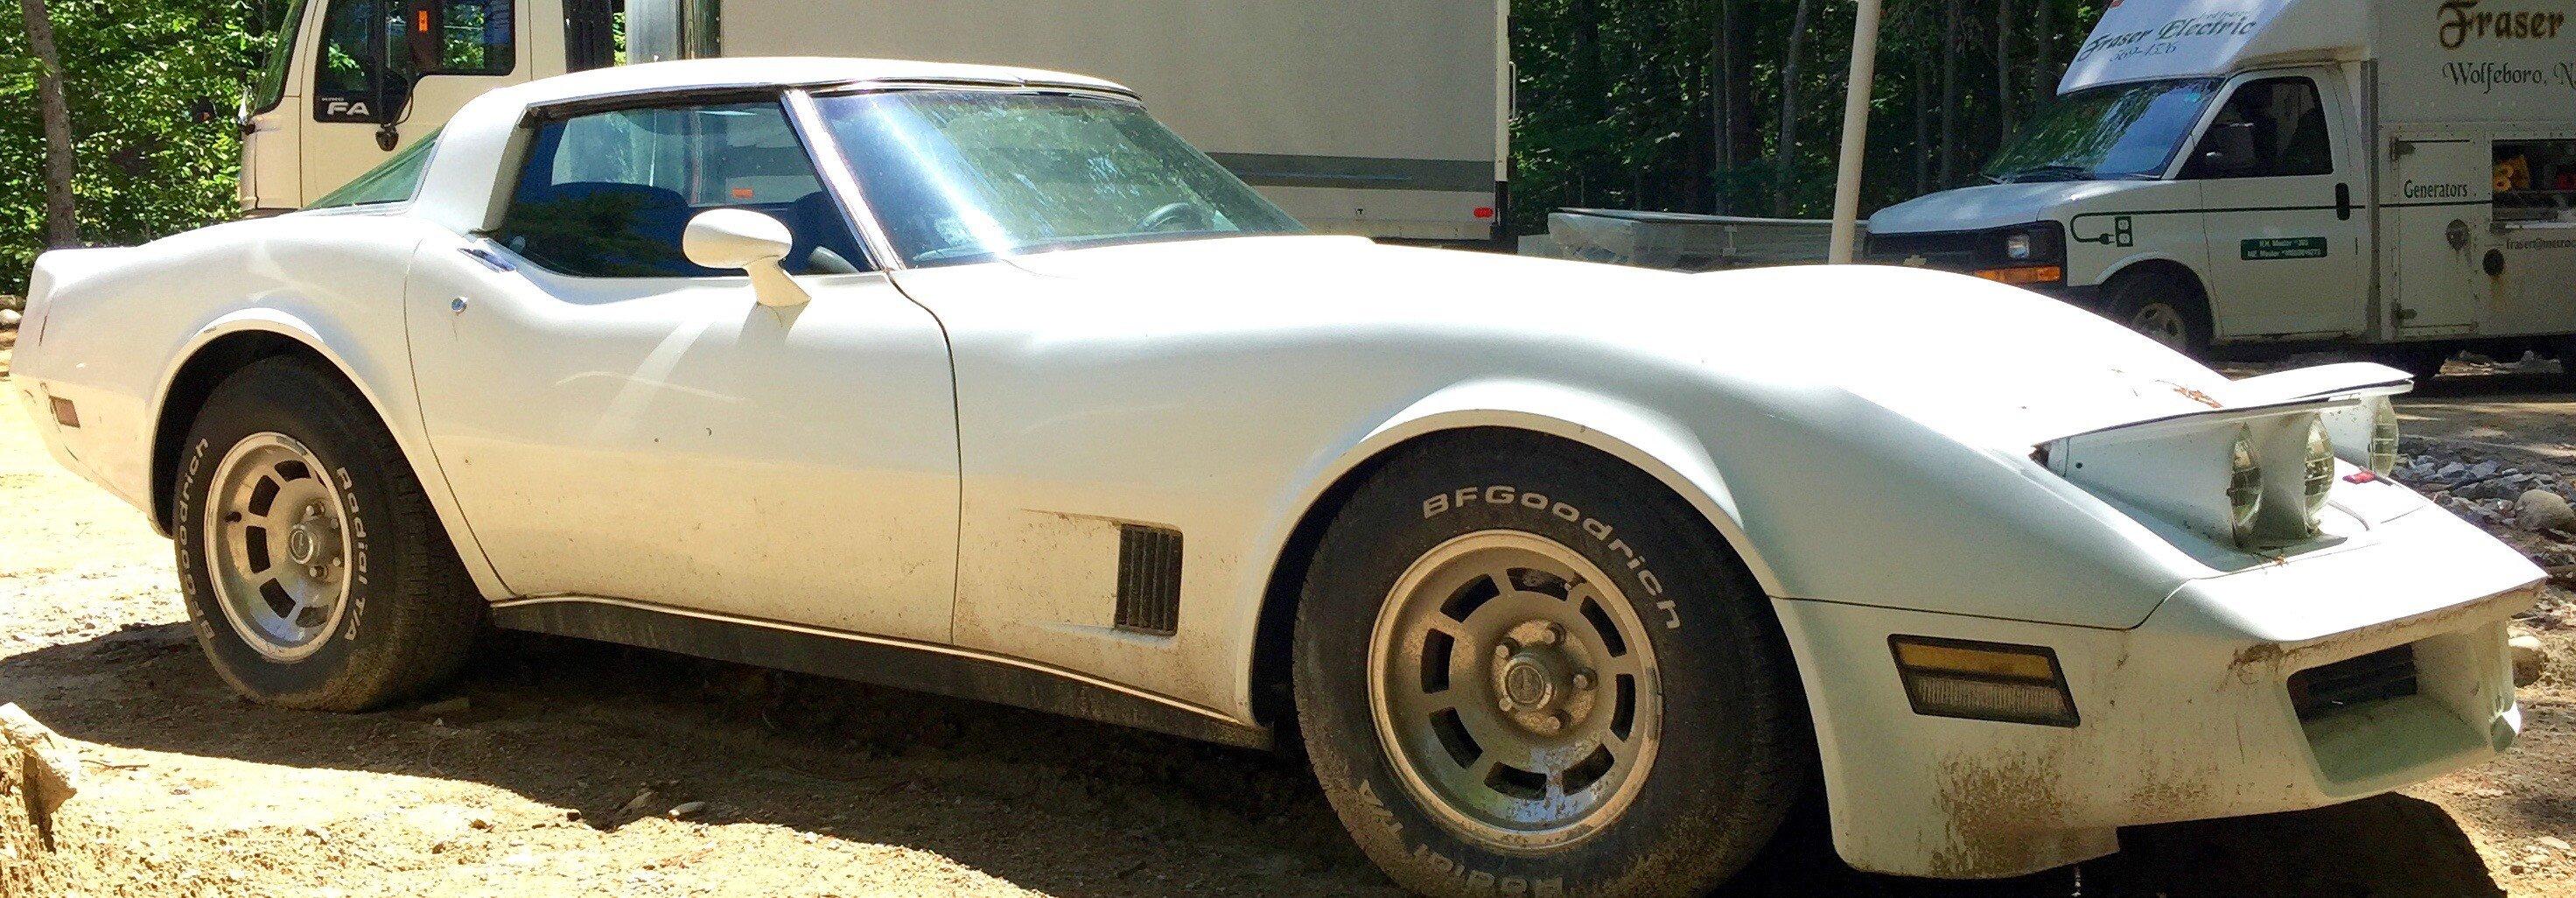 1980 Corvette For Sale >> 1980 Chevrolet Corvette For Sale Near Meredith New Hampshire 03253 Classics On Autotrader